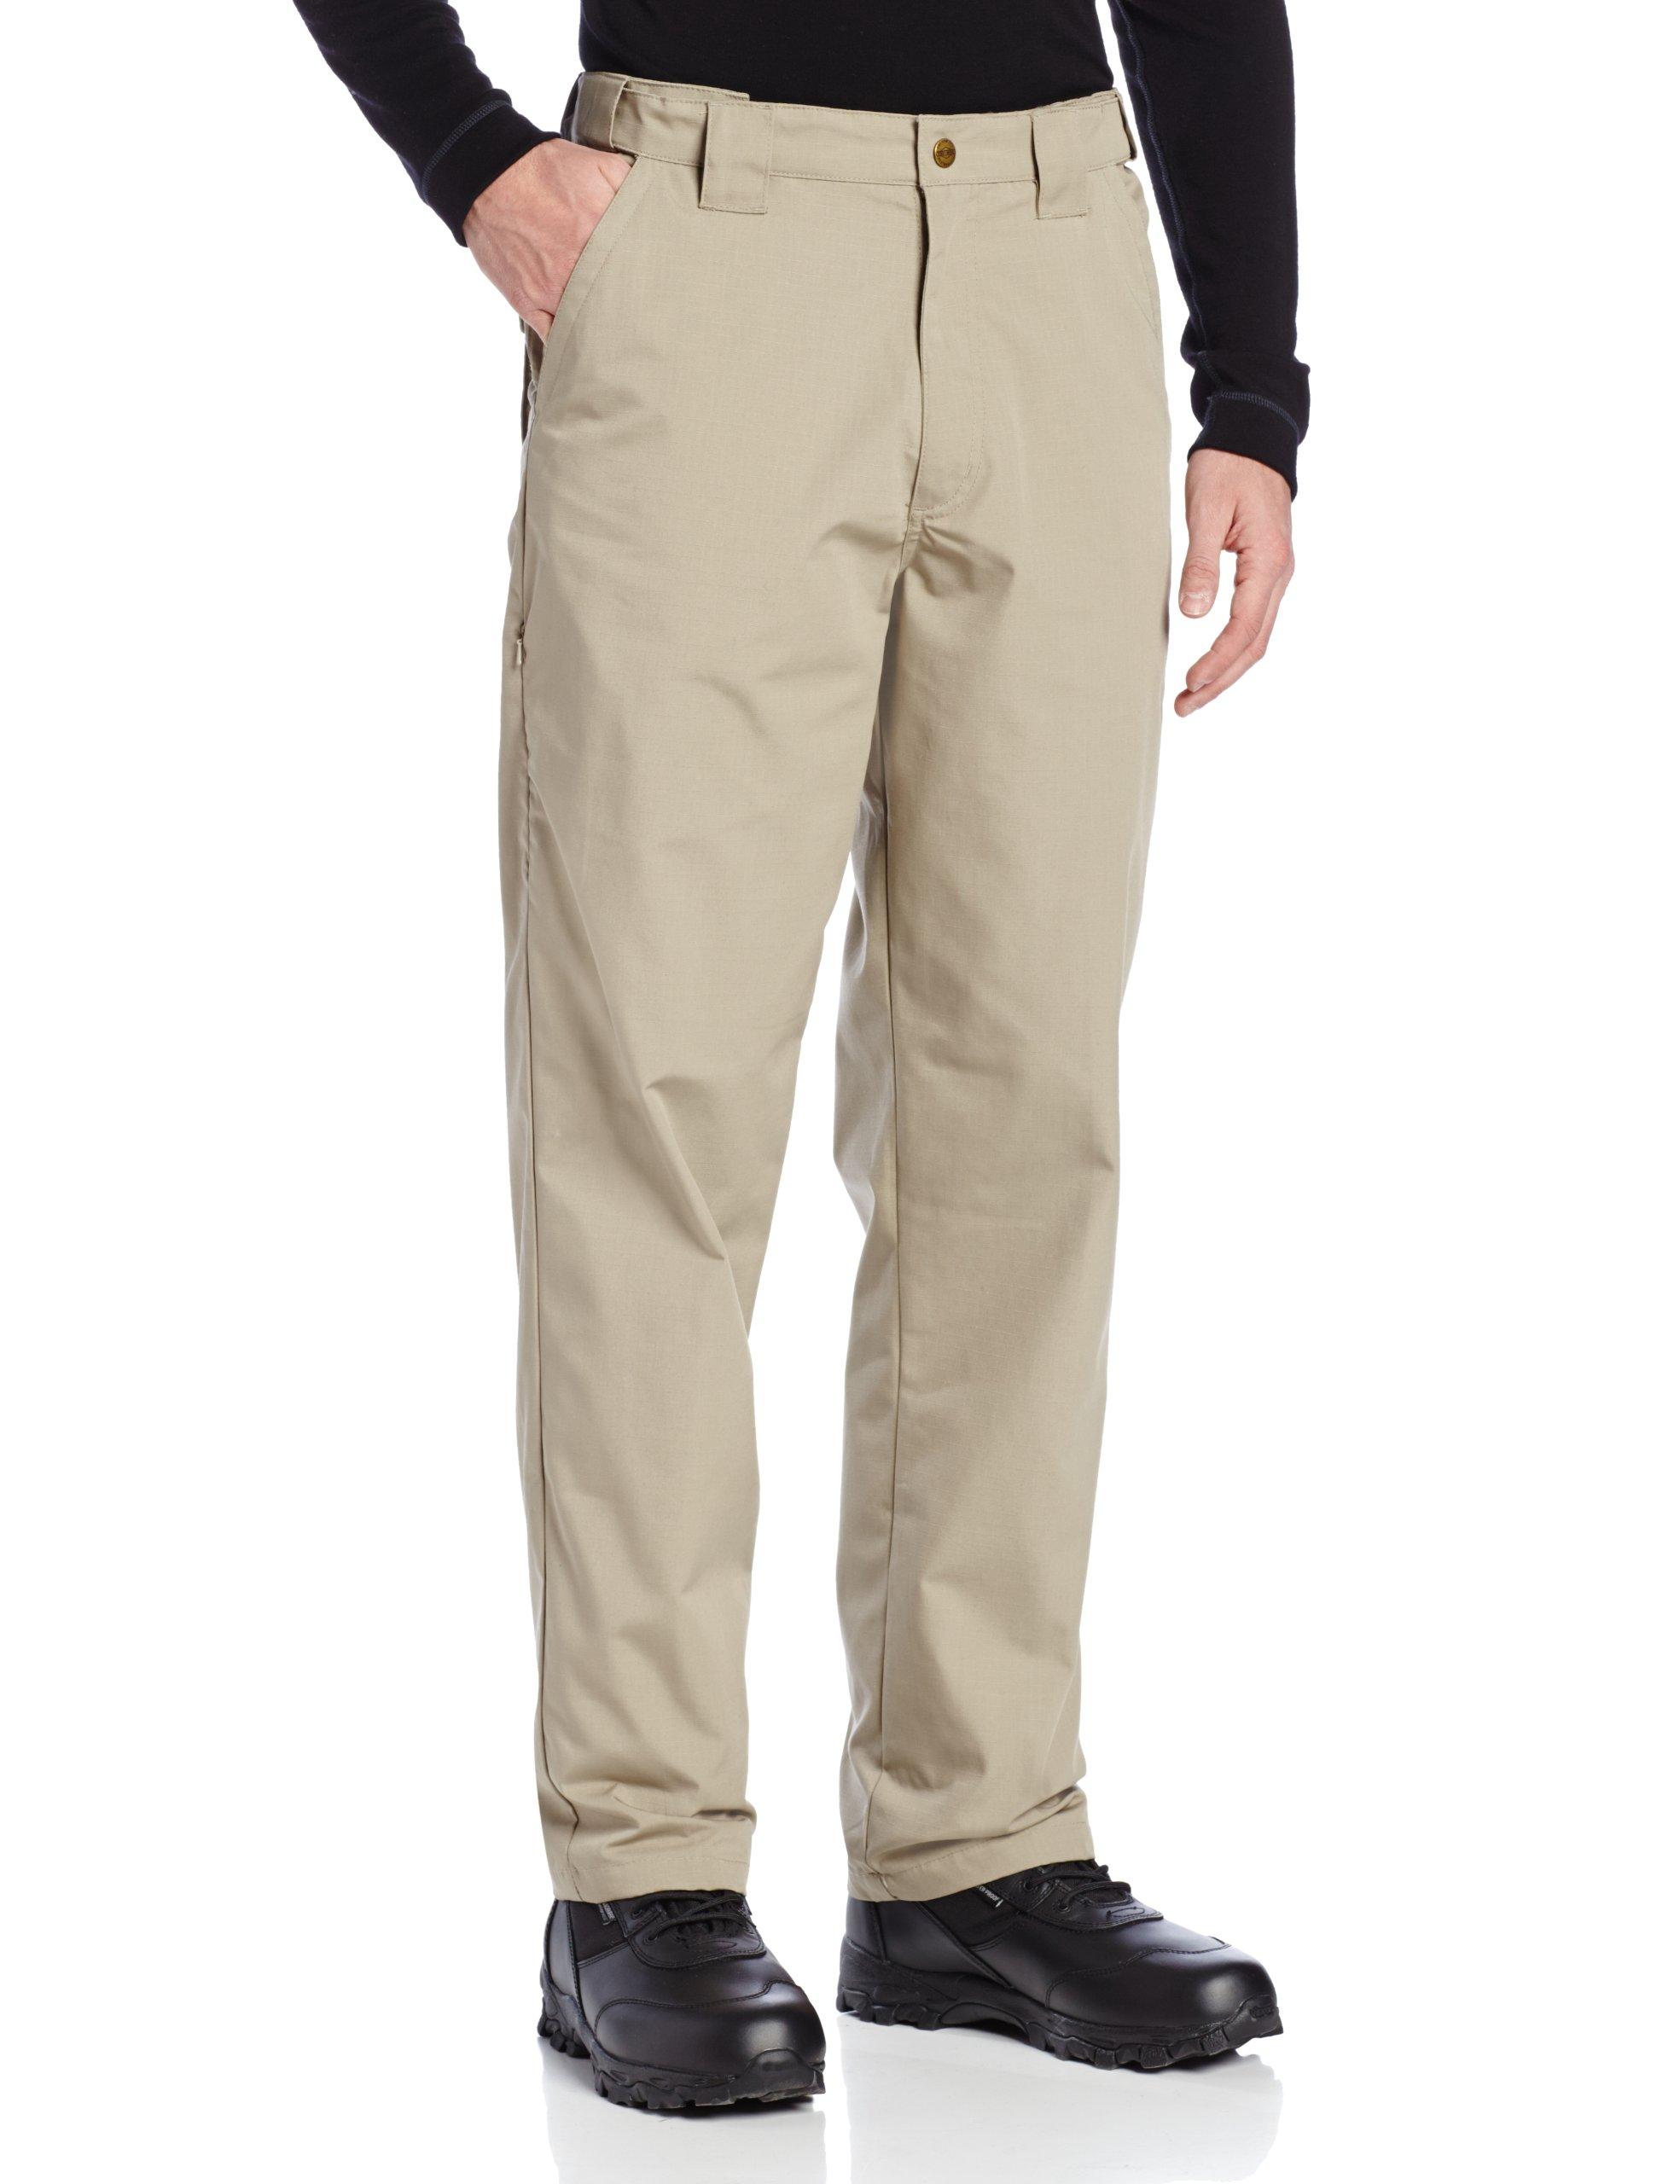 TRU-SPEC Men's 24-7 Classic Pants